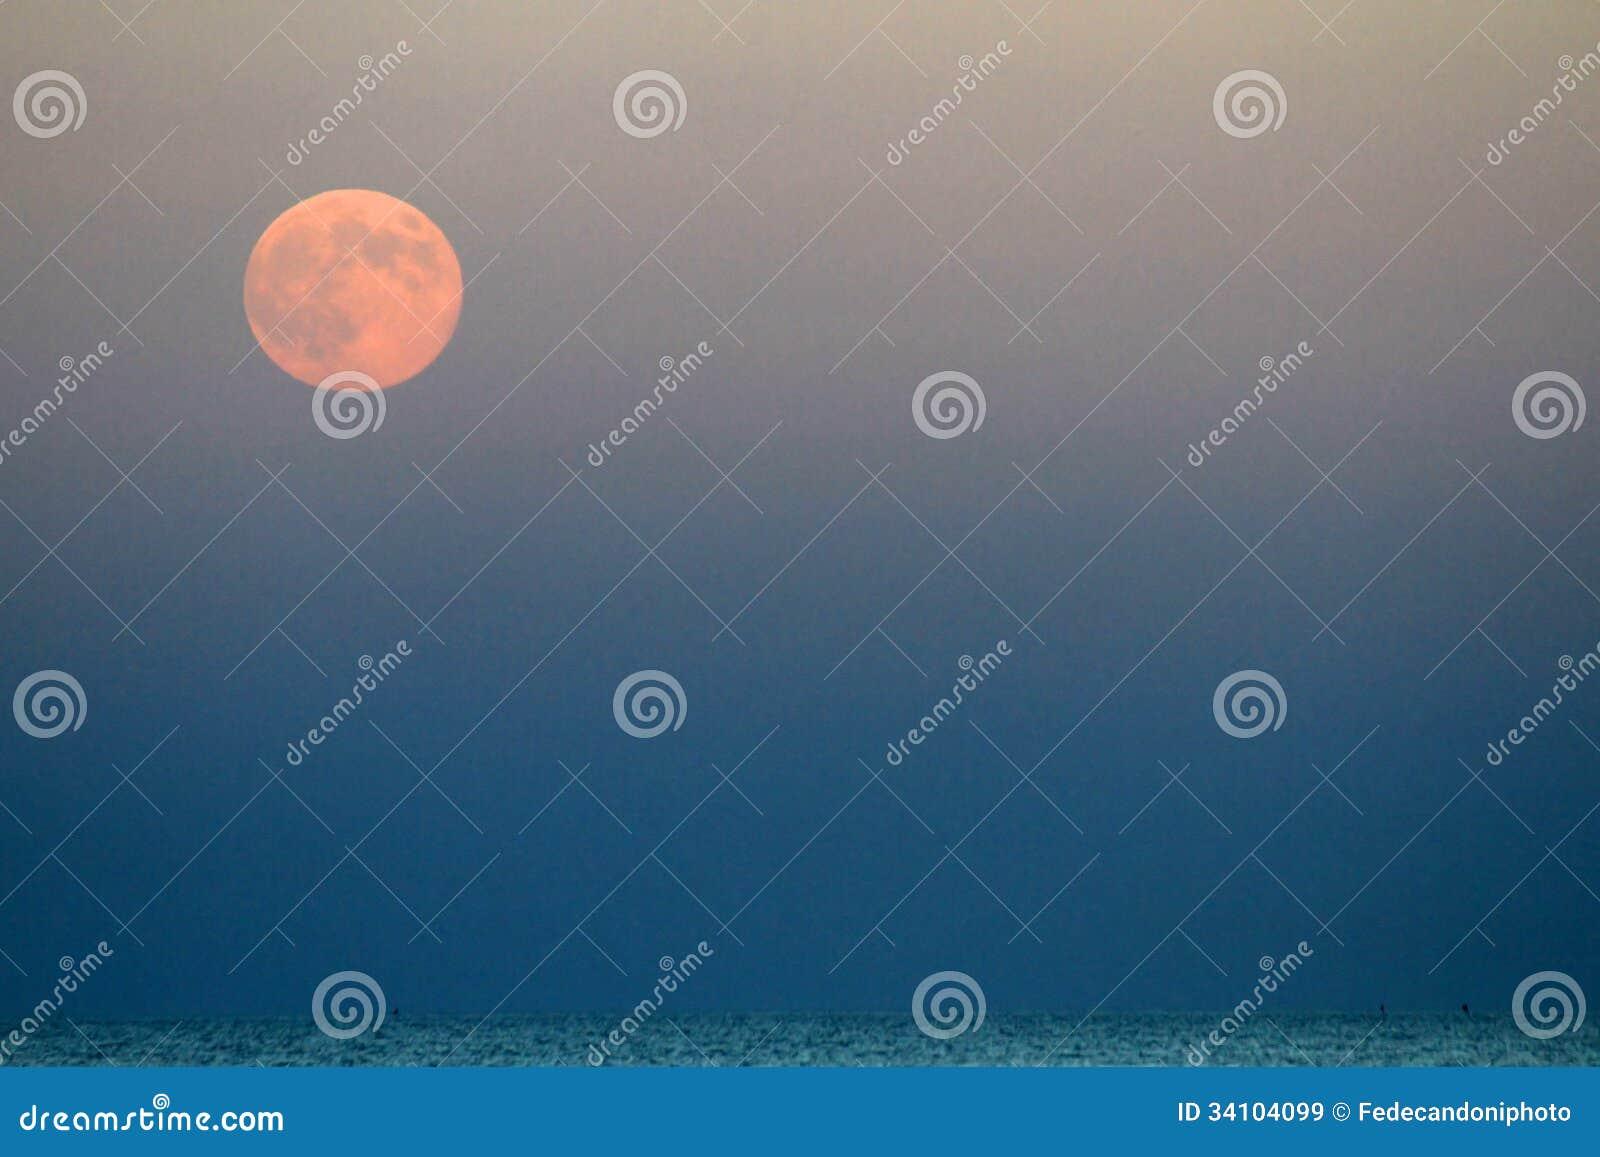 red moon blue sea - photo #29